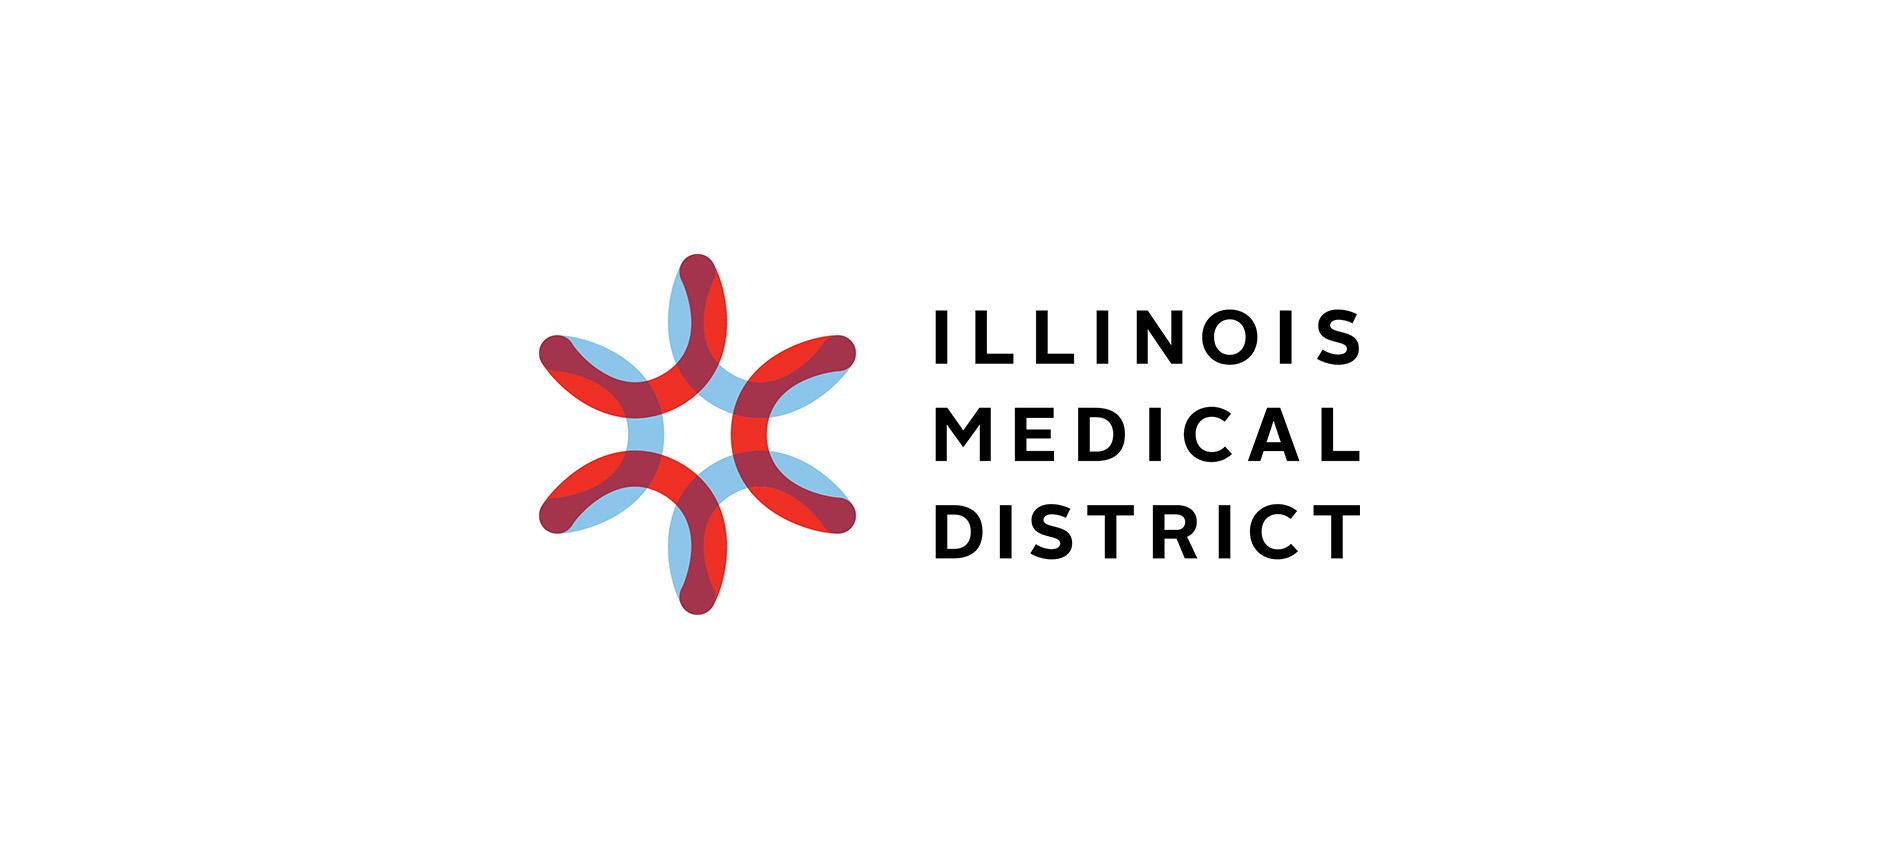 Illinois_Medical_district_logo.jpg